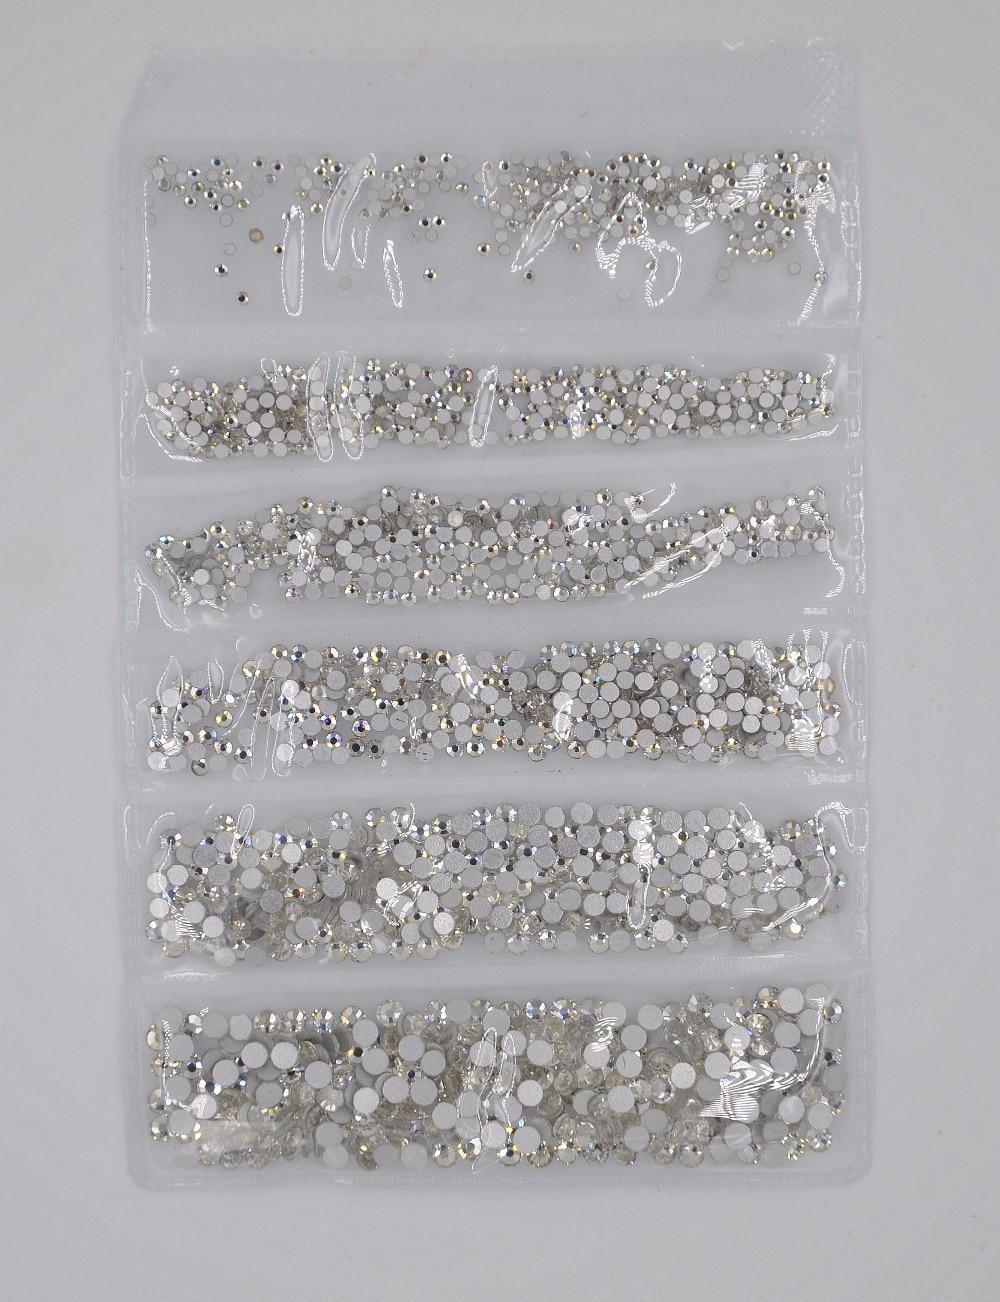 Crystal Clear SS3-SS10 Mix Sizes 1700PCSBag Nail Art Decorations GlassCrystal Non HotFix Rhinestones